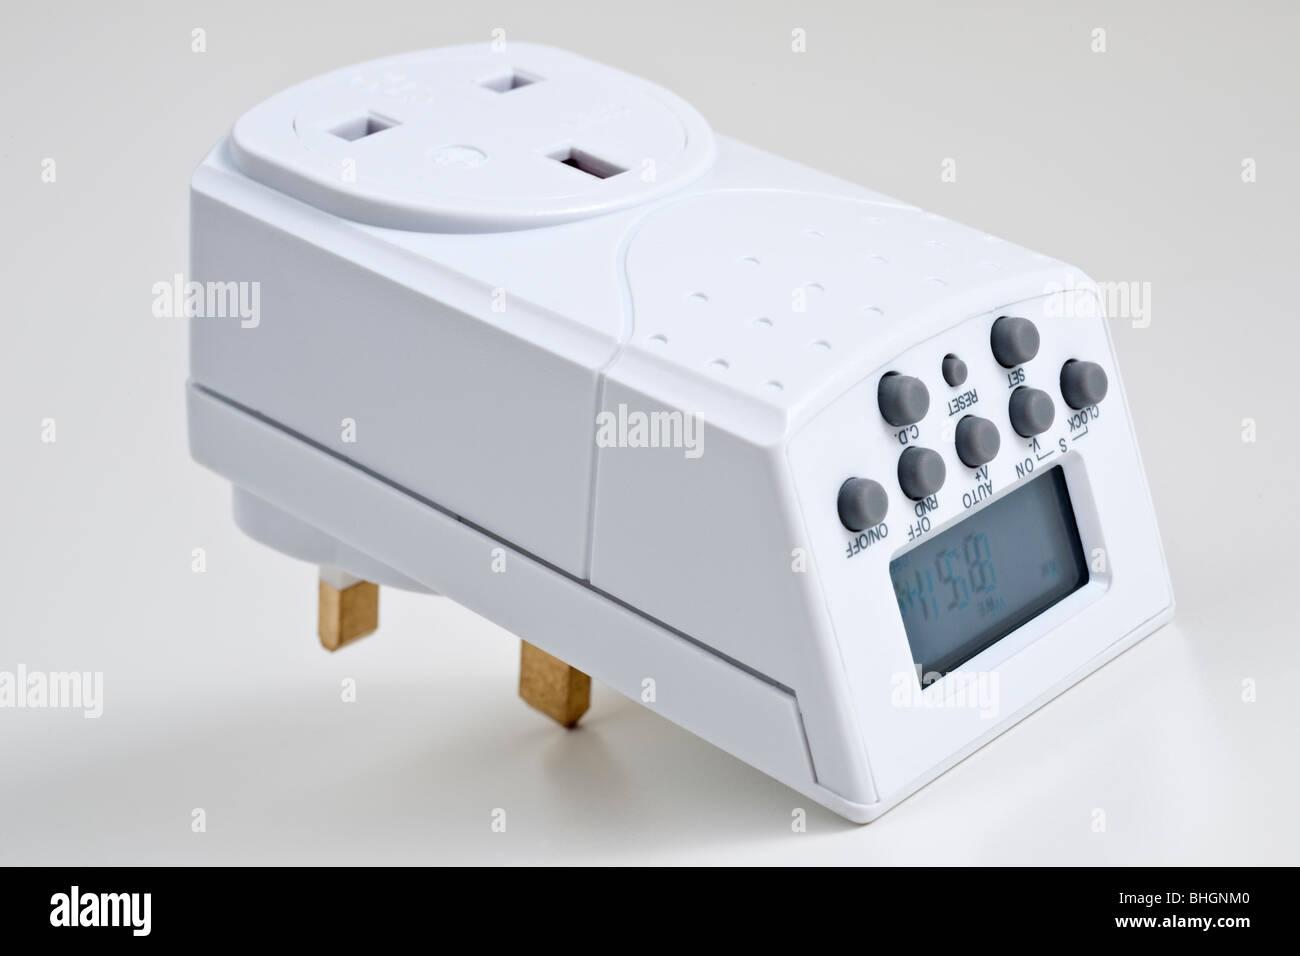 24 hour digital UK mains electrical household socket timer - Stock Image